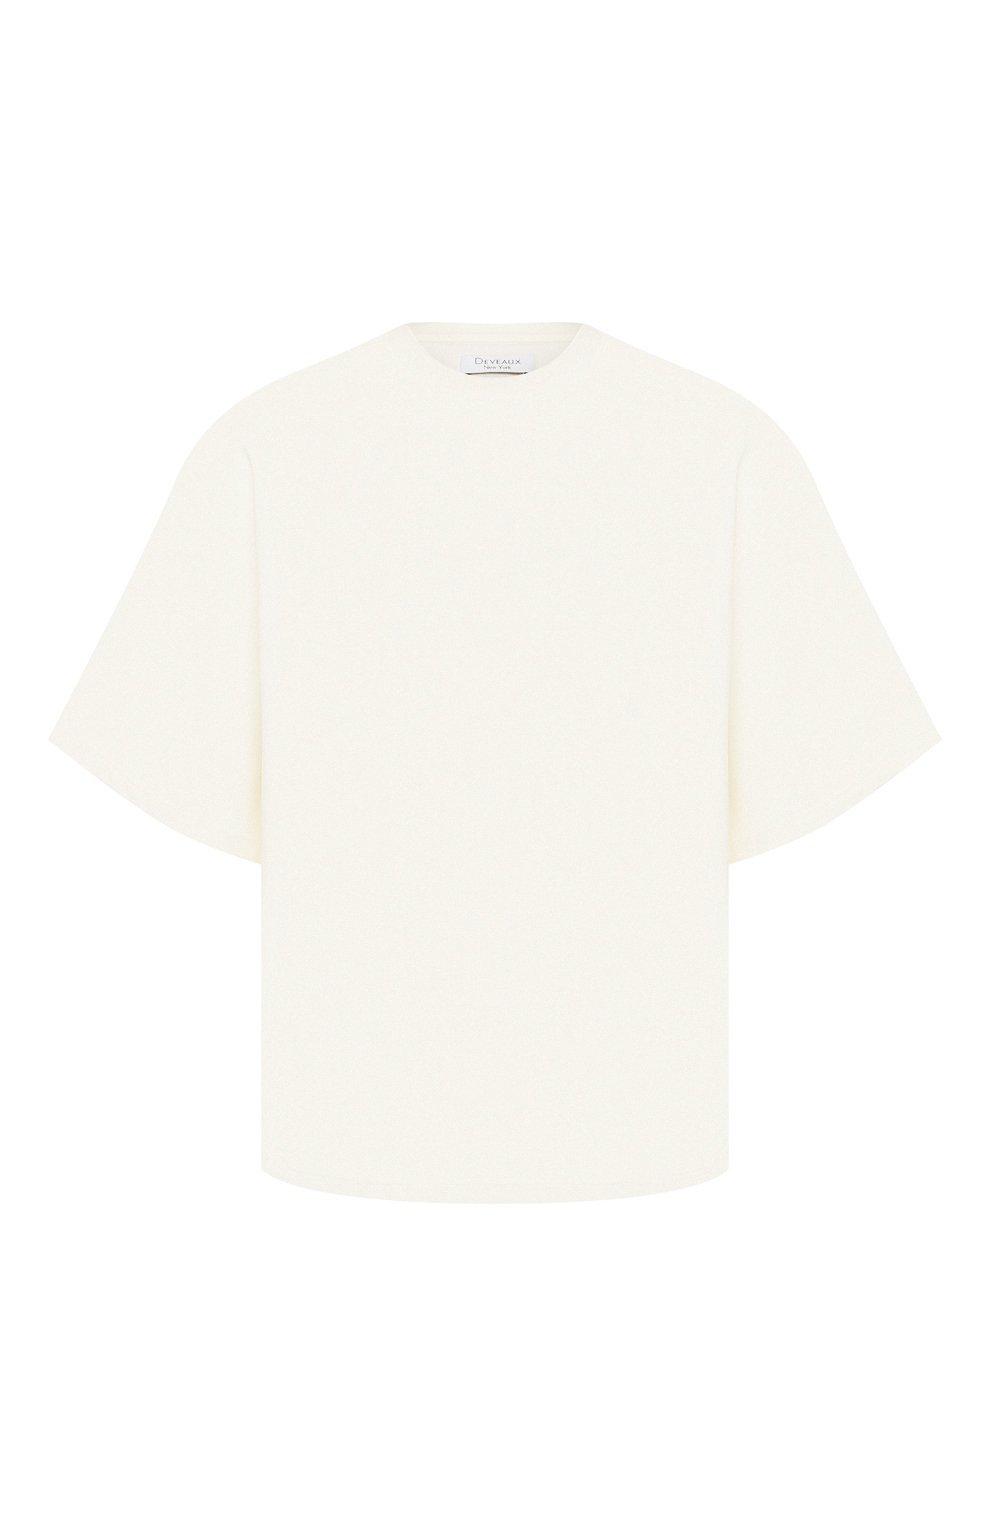 Женская футболка DEVEAUX NEW YORK кремвого цвета, арт. W201-600-AG4   Фото 1